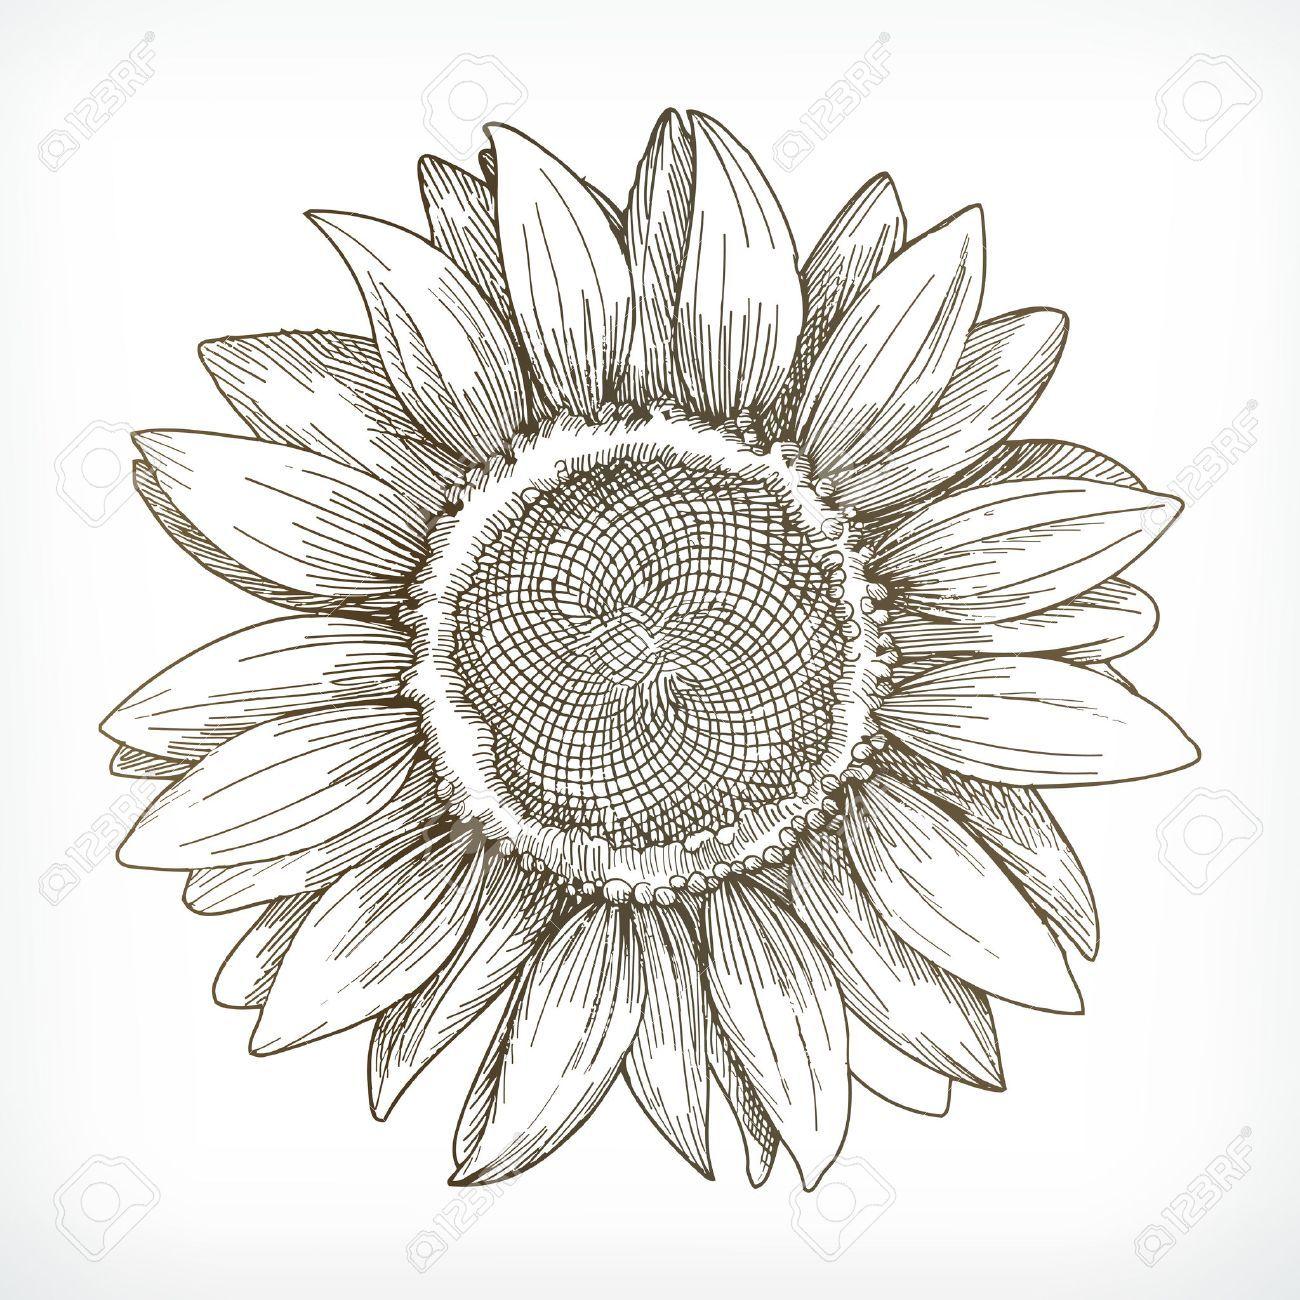 Resultado De Imagem Para Illustration Girasoles Dibujo Flores Dibujadas A Lapiz Ilustracion De Girasol